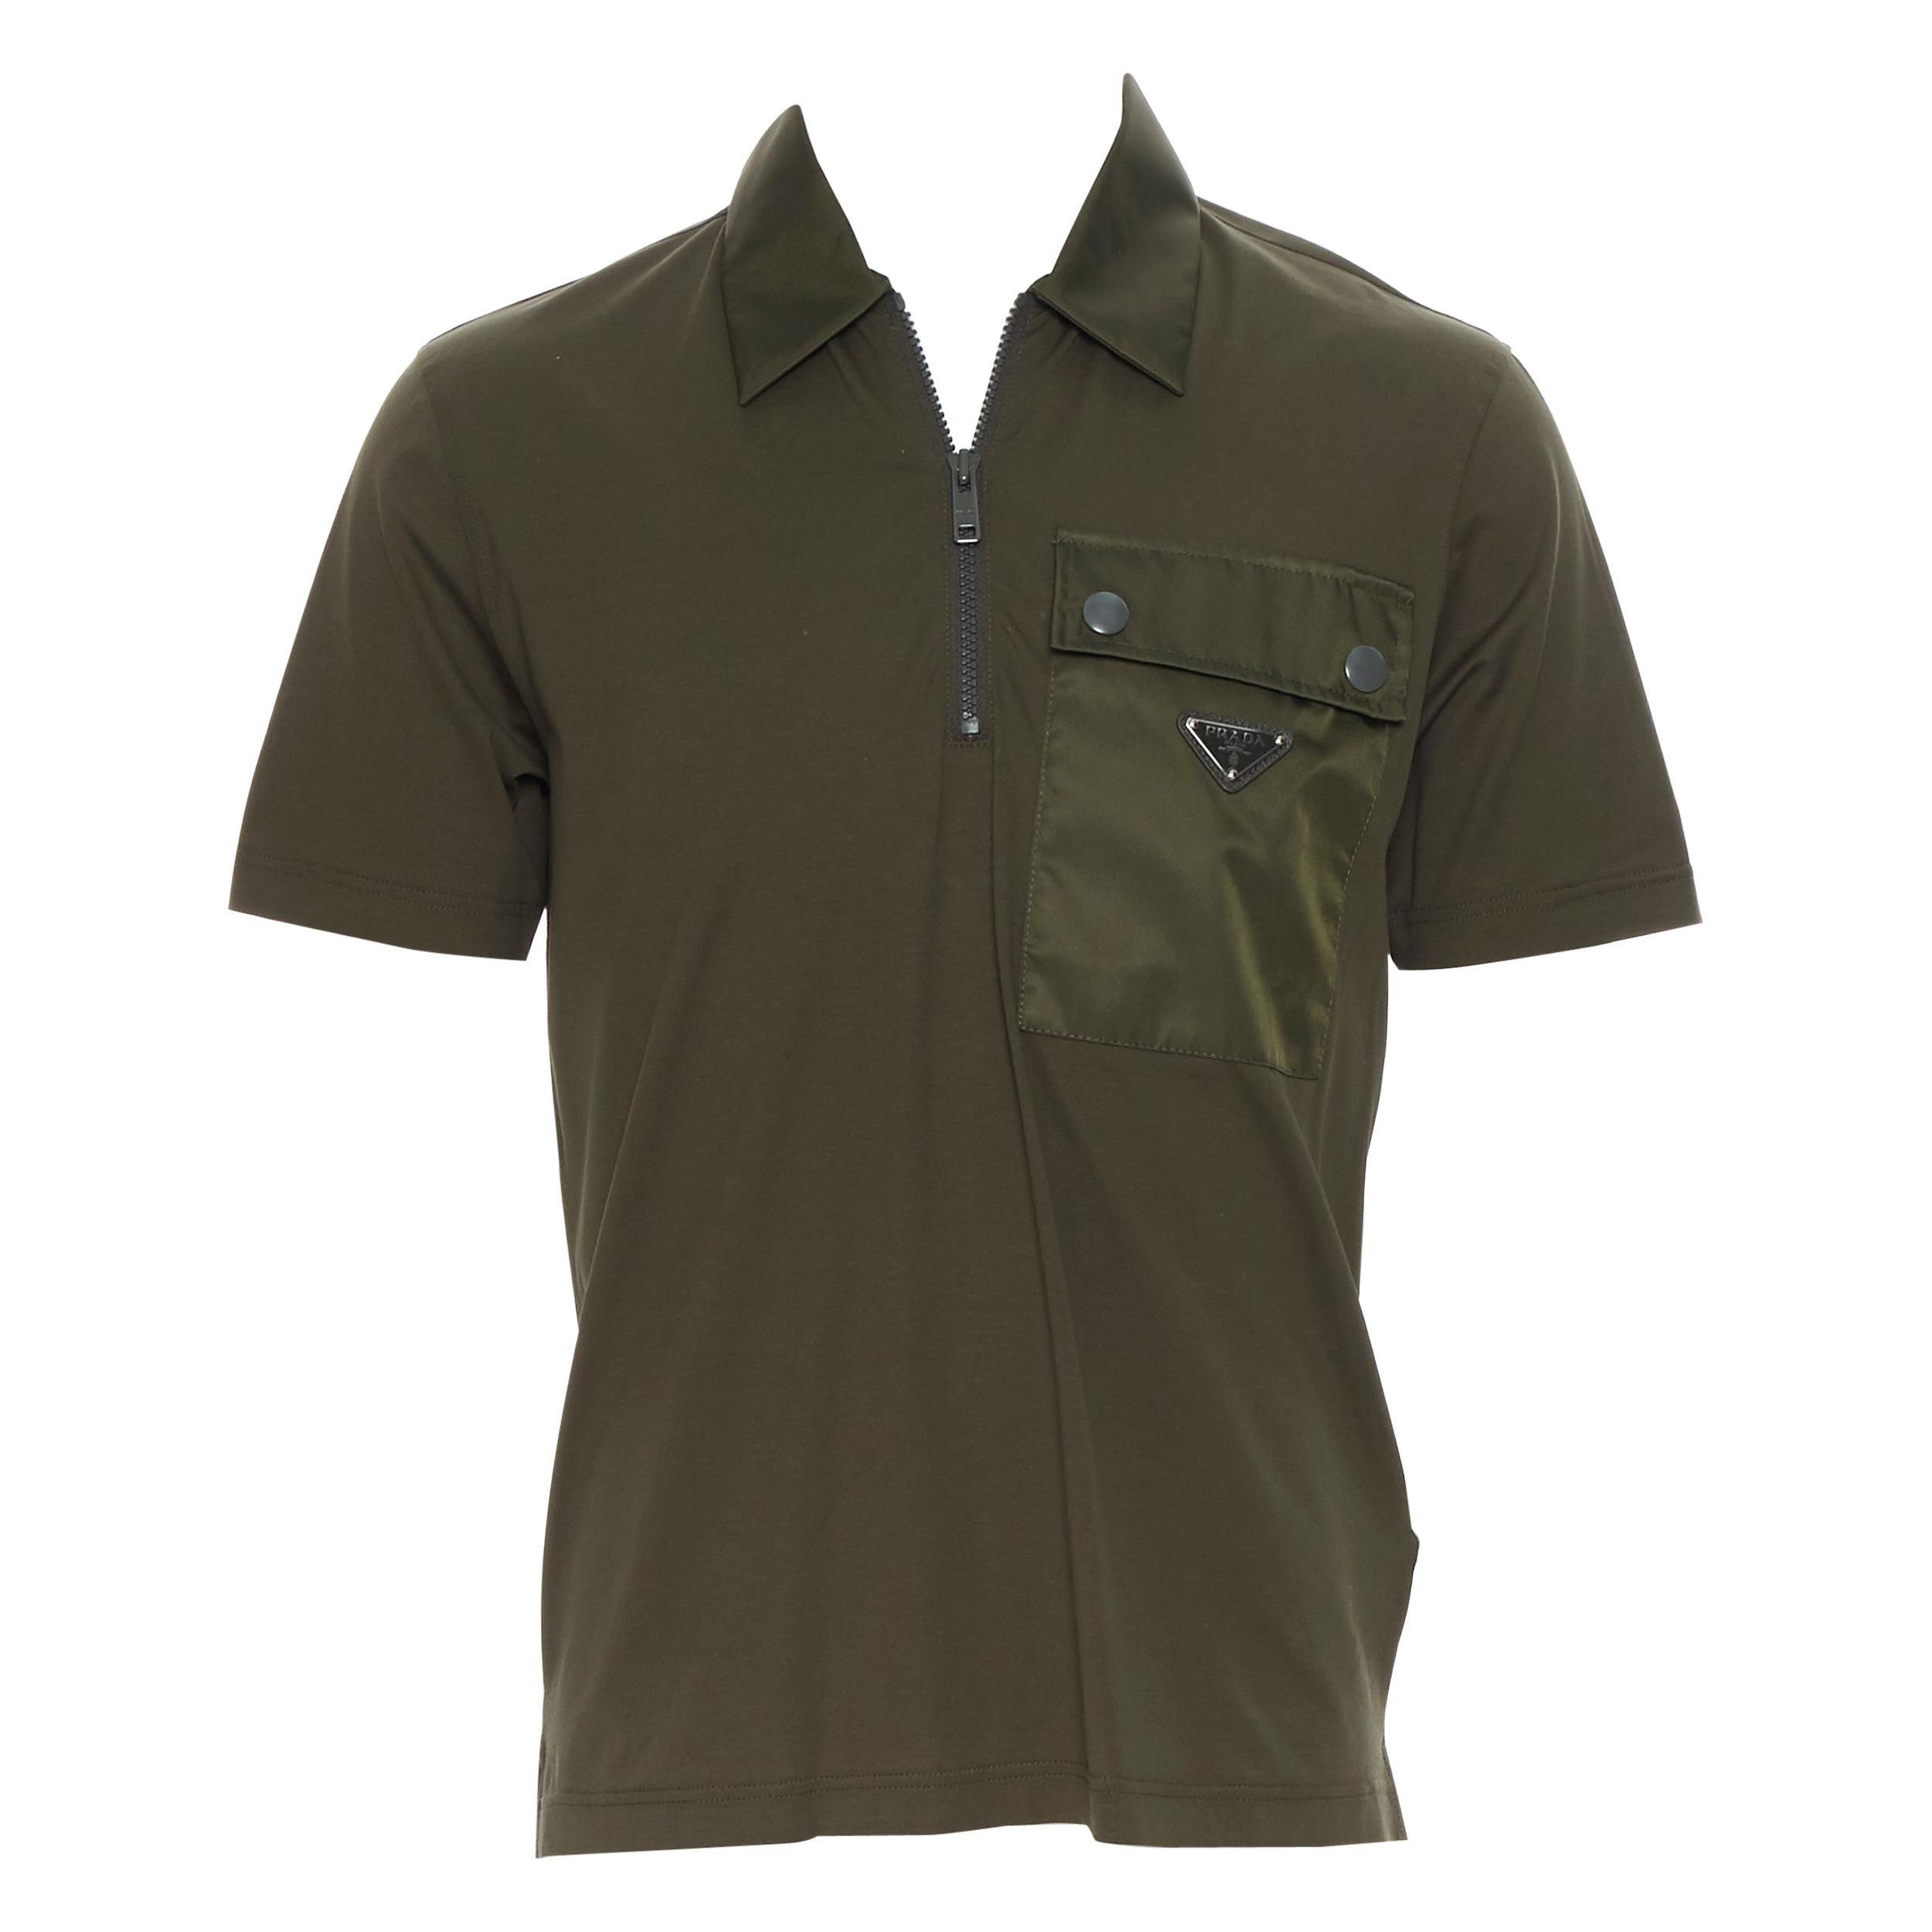 new PRADA 2019 army green cotton triangle logo plate pocket polo shirt top S